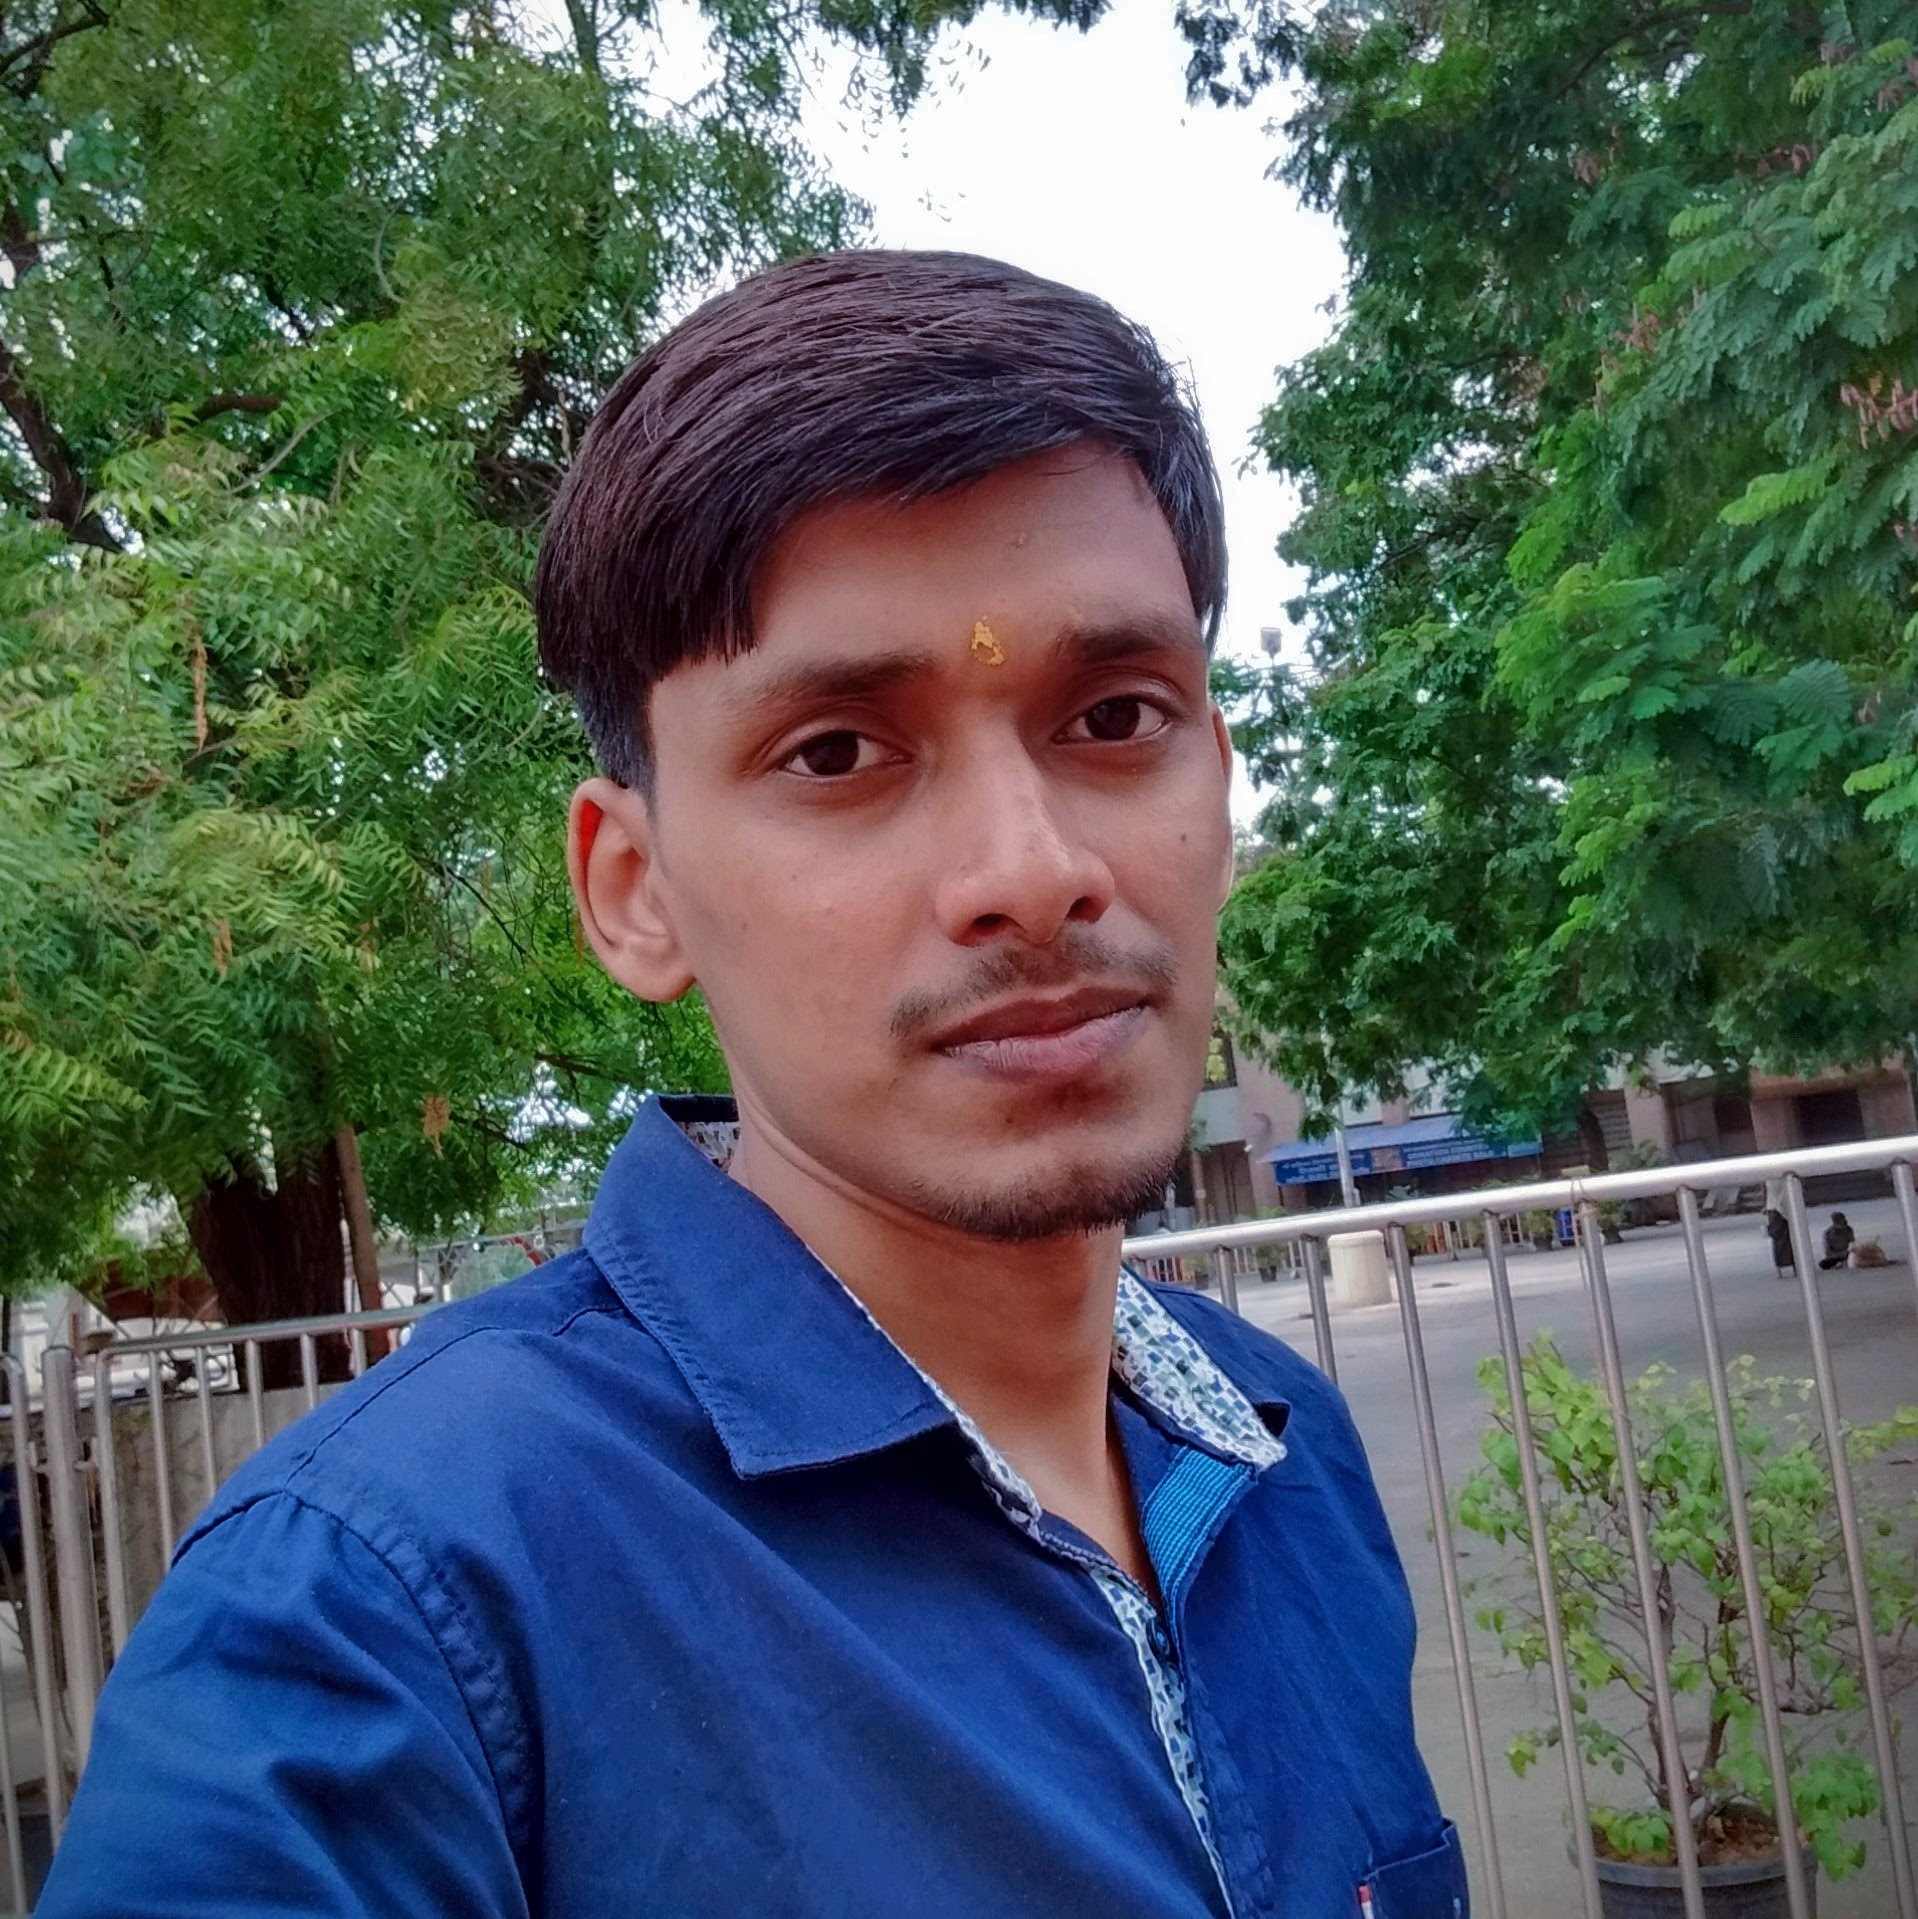 Go to Amit yadav's profile